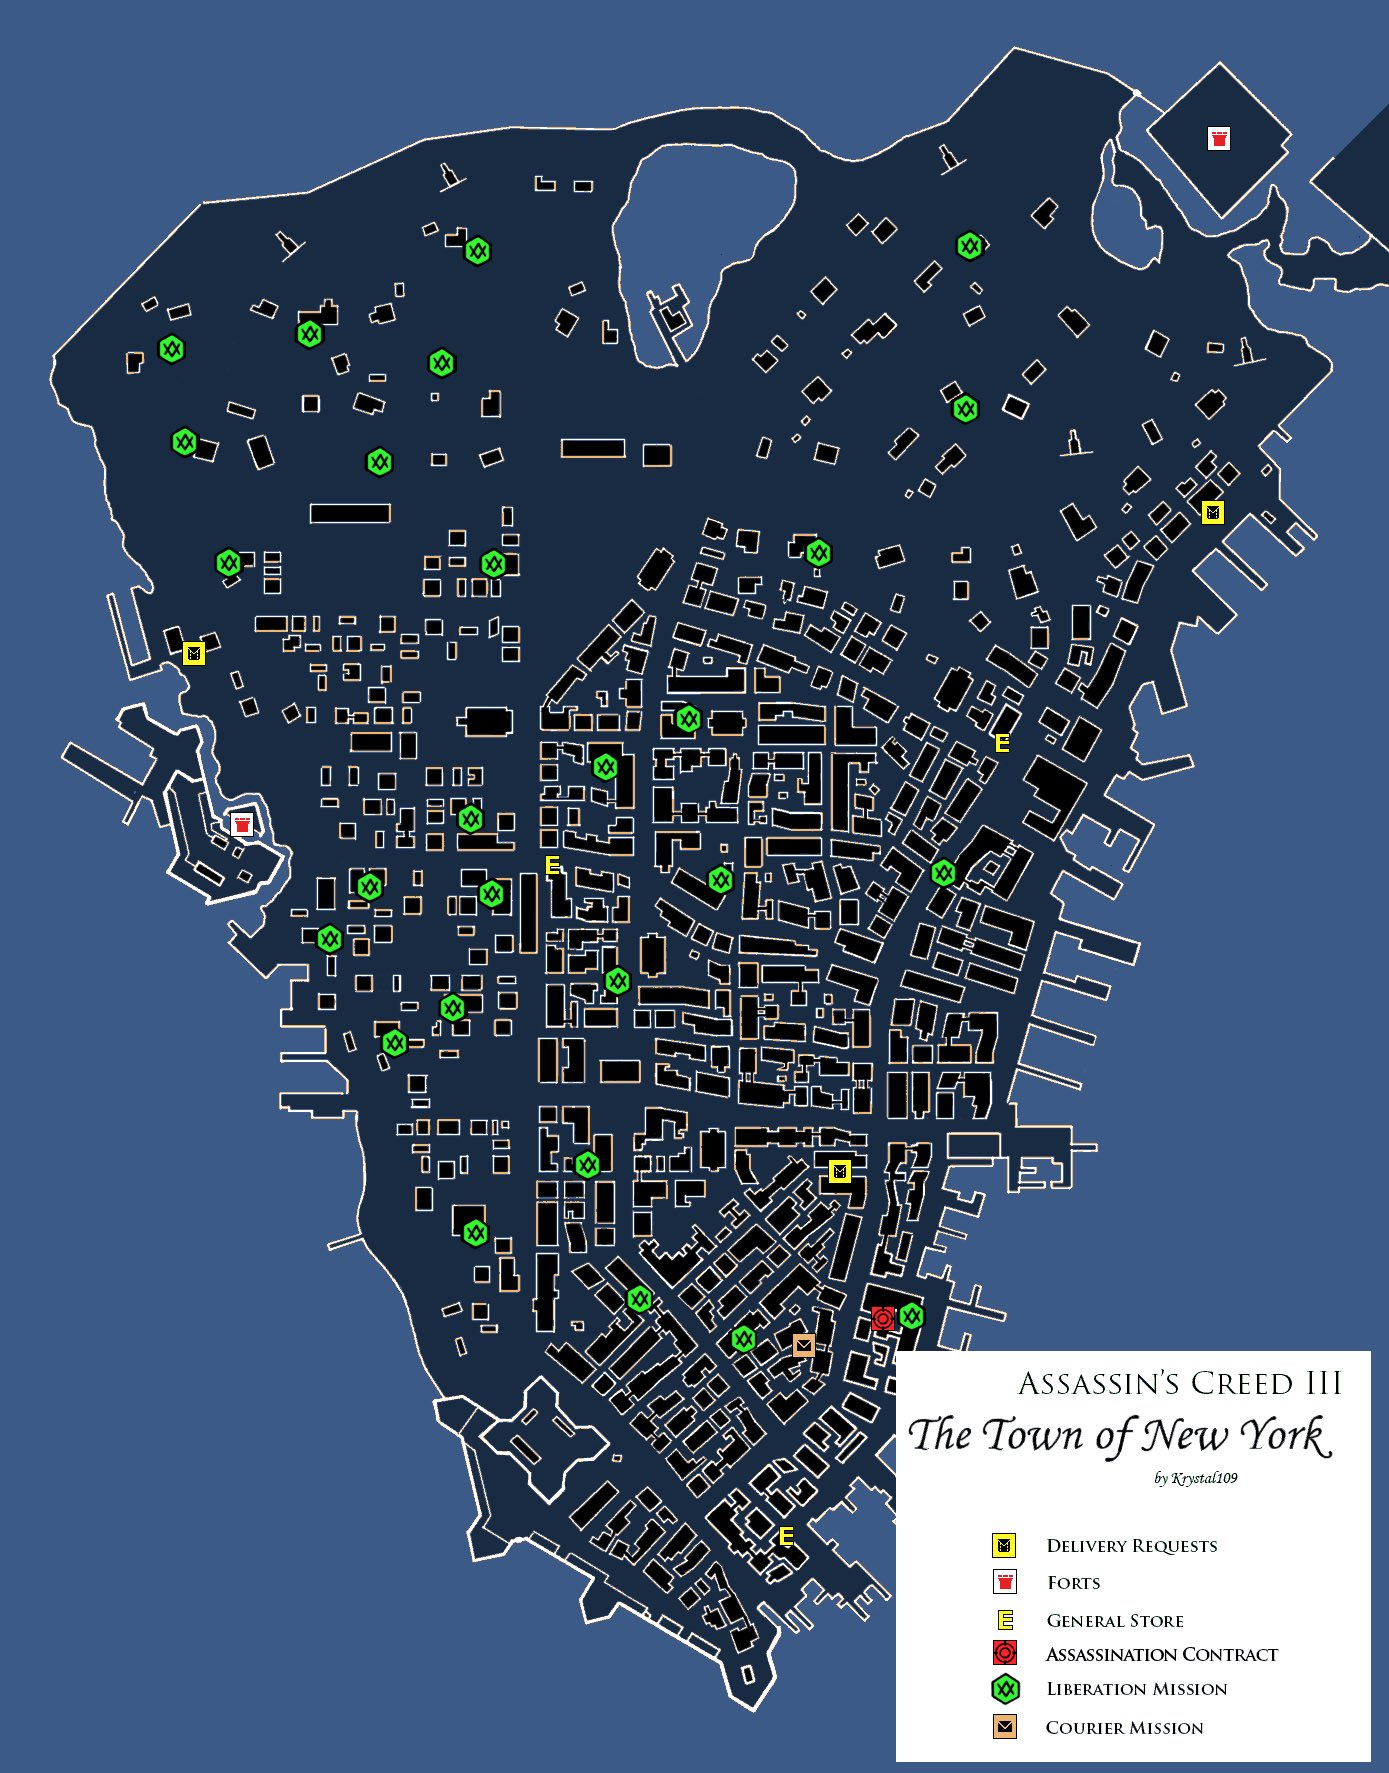 Open World On Twitter Assassin S Creed Iii 2012 Main Locations